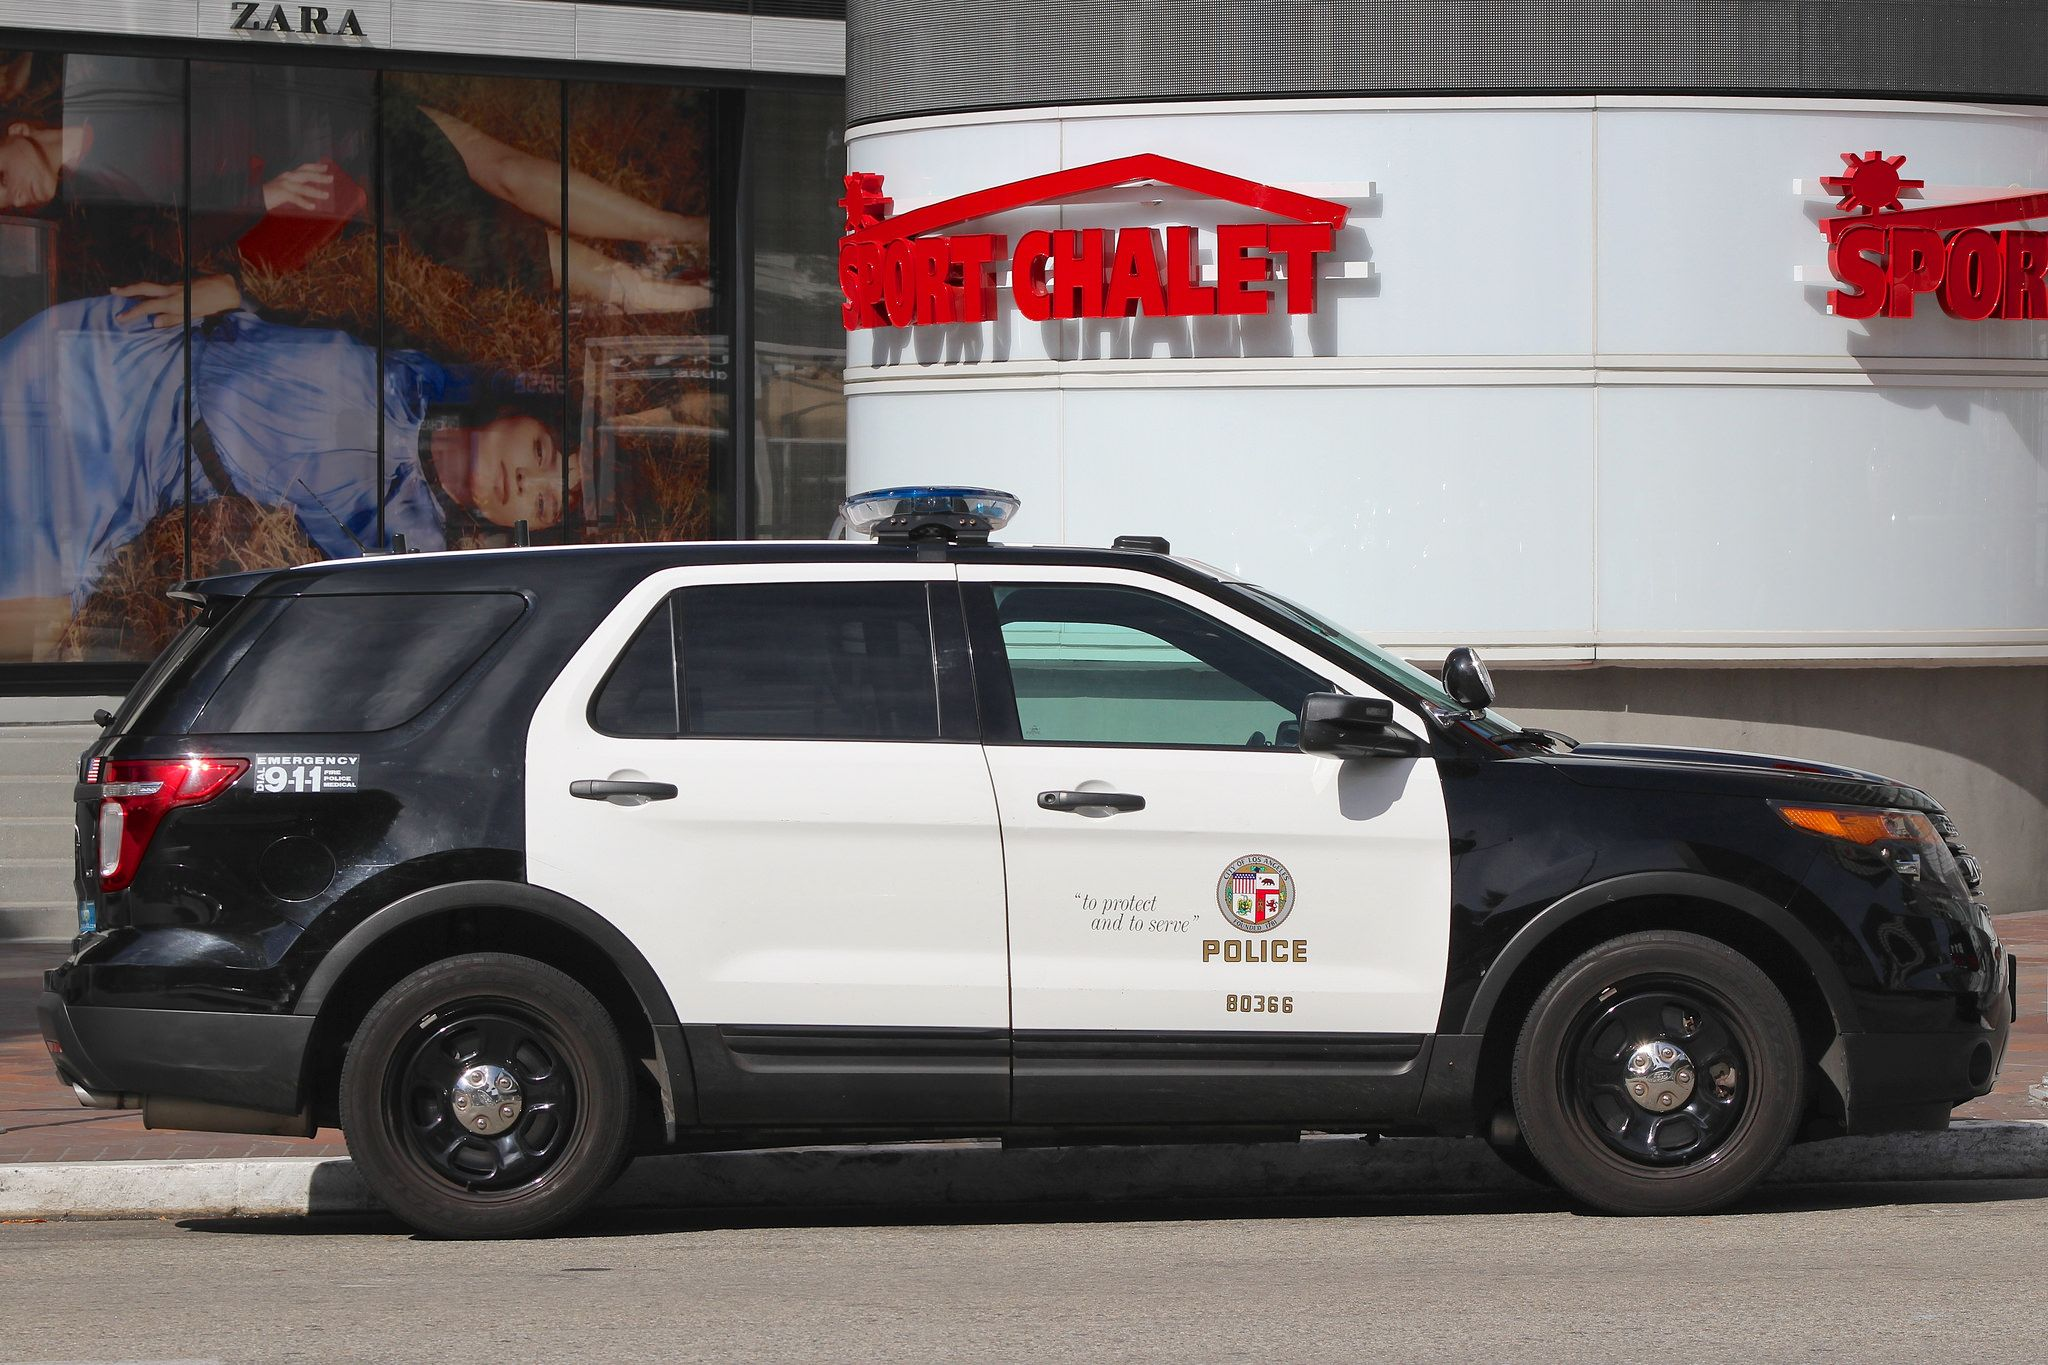 Lapd Police Cars Ford Police Us Police Car